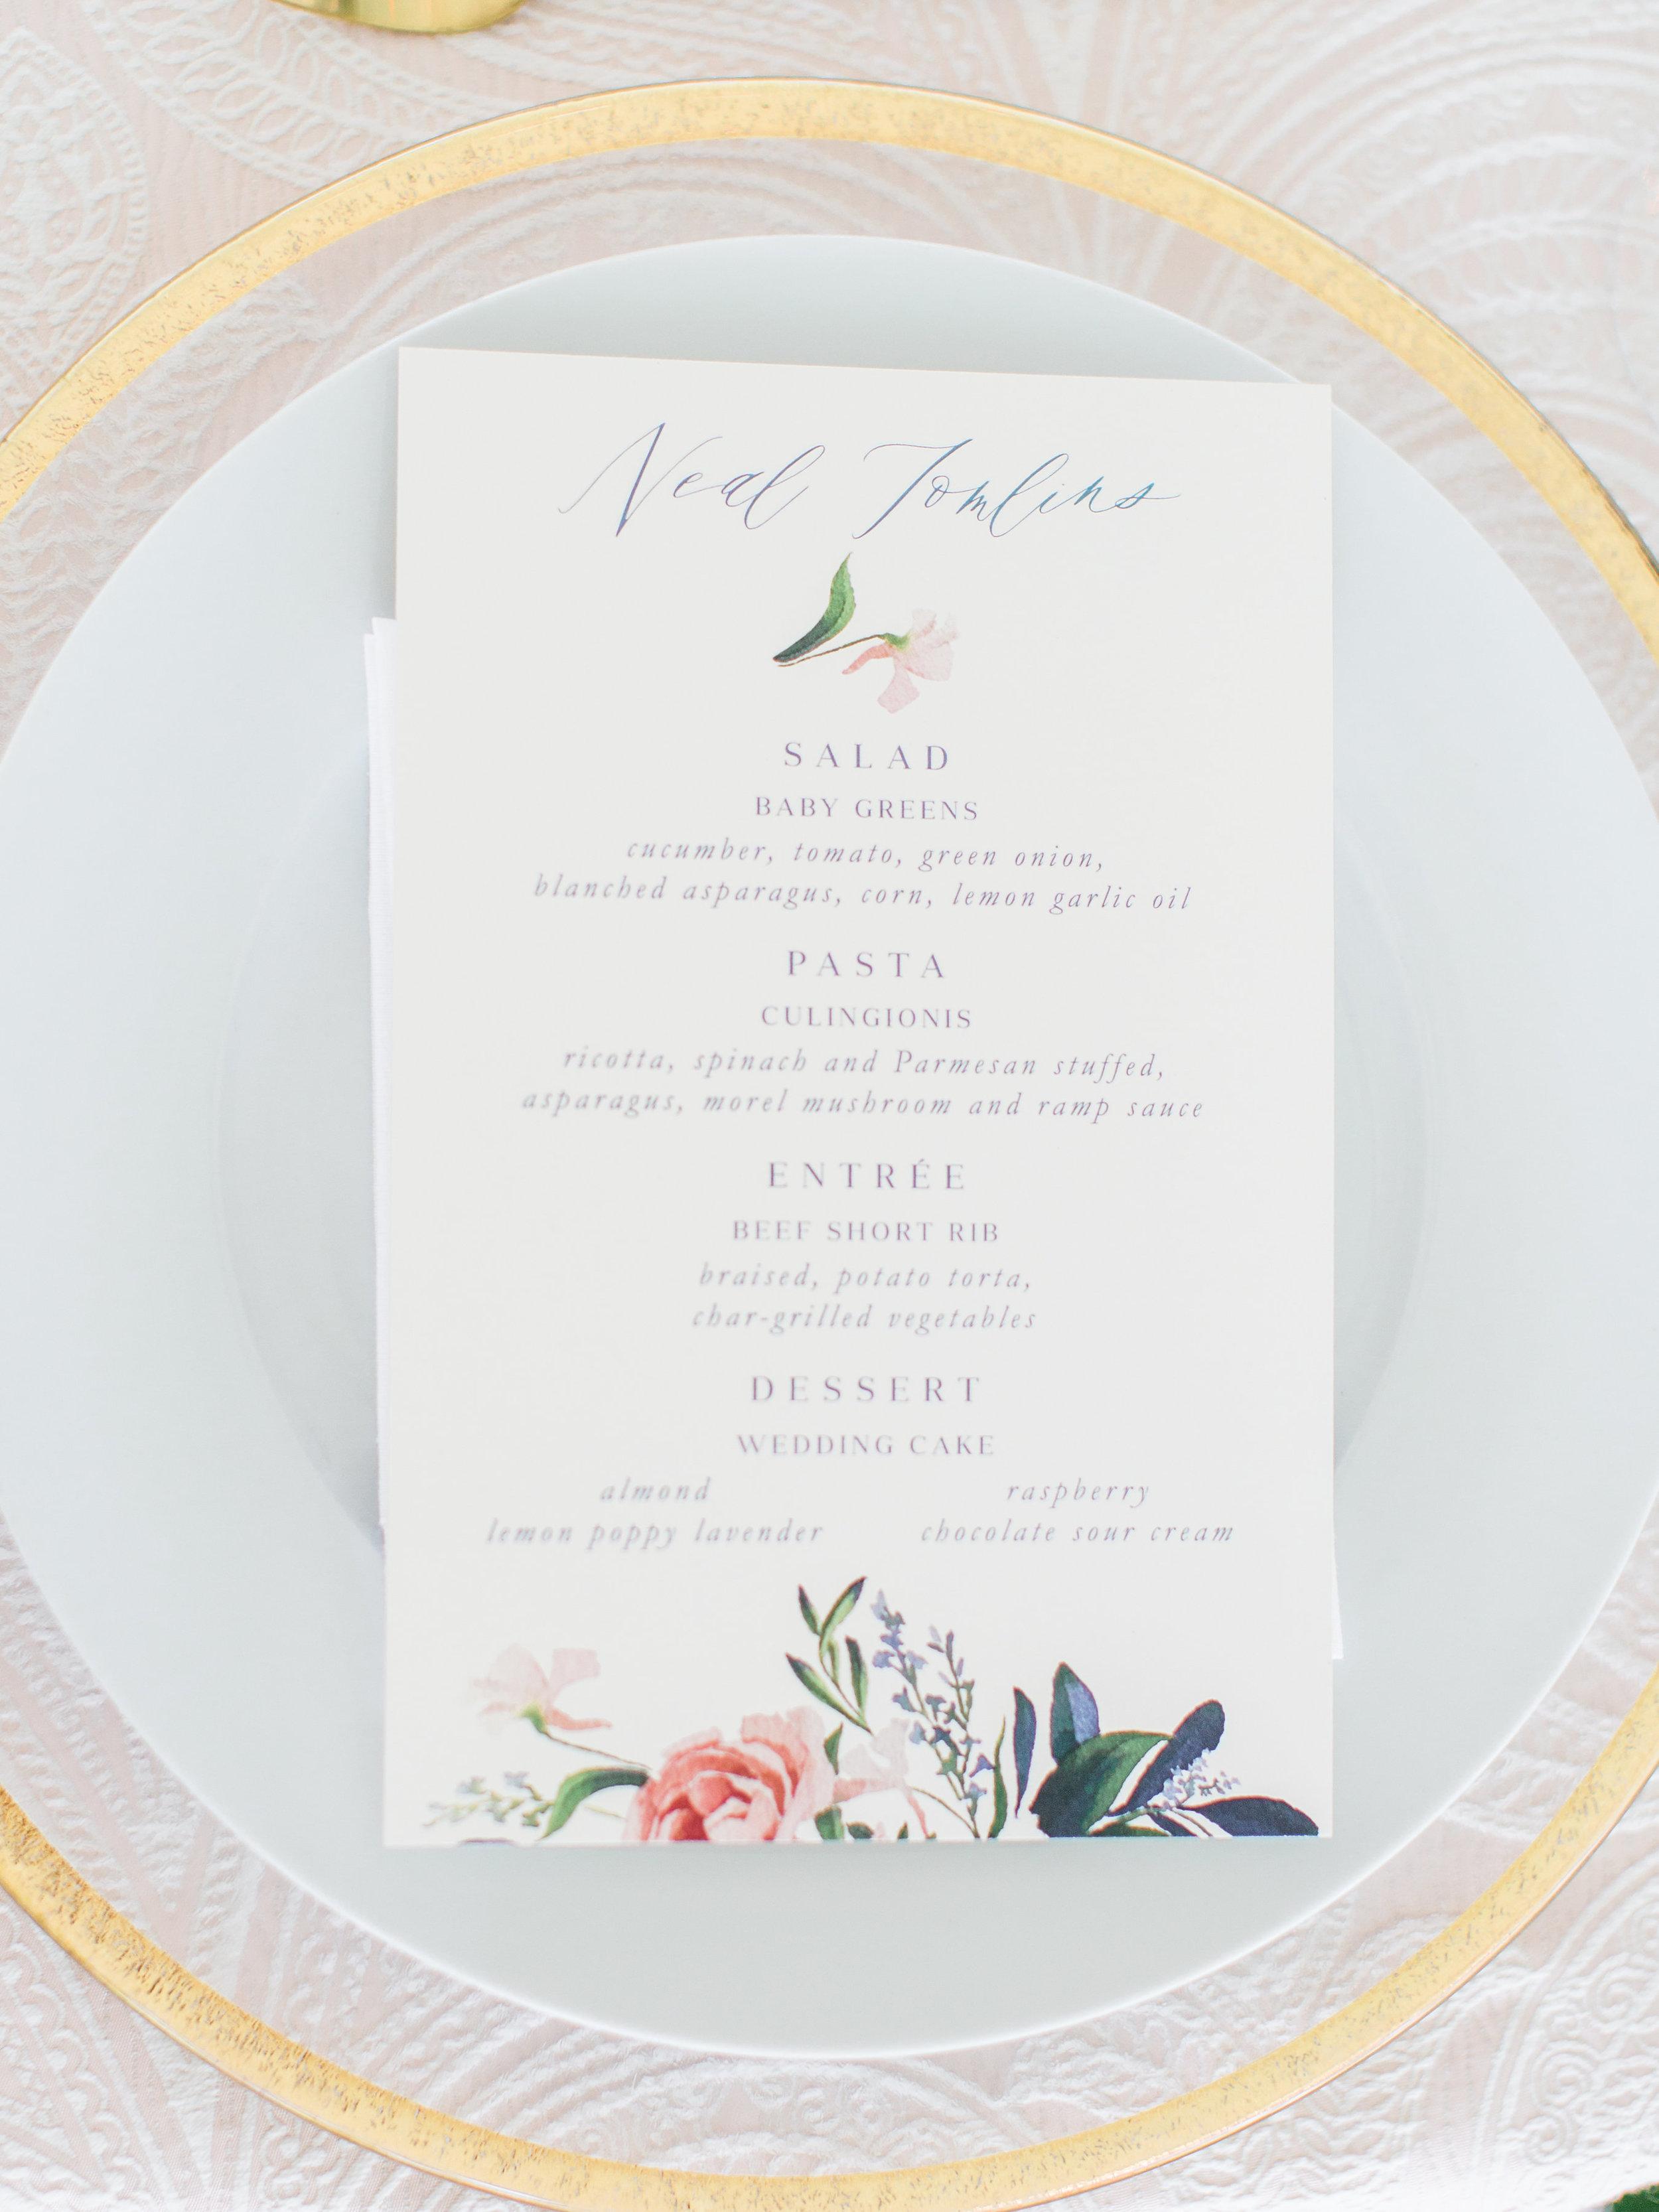 Coffman+Wedding+Reception+Details-15.jpg